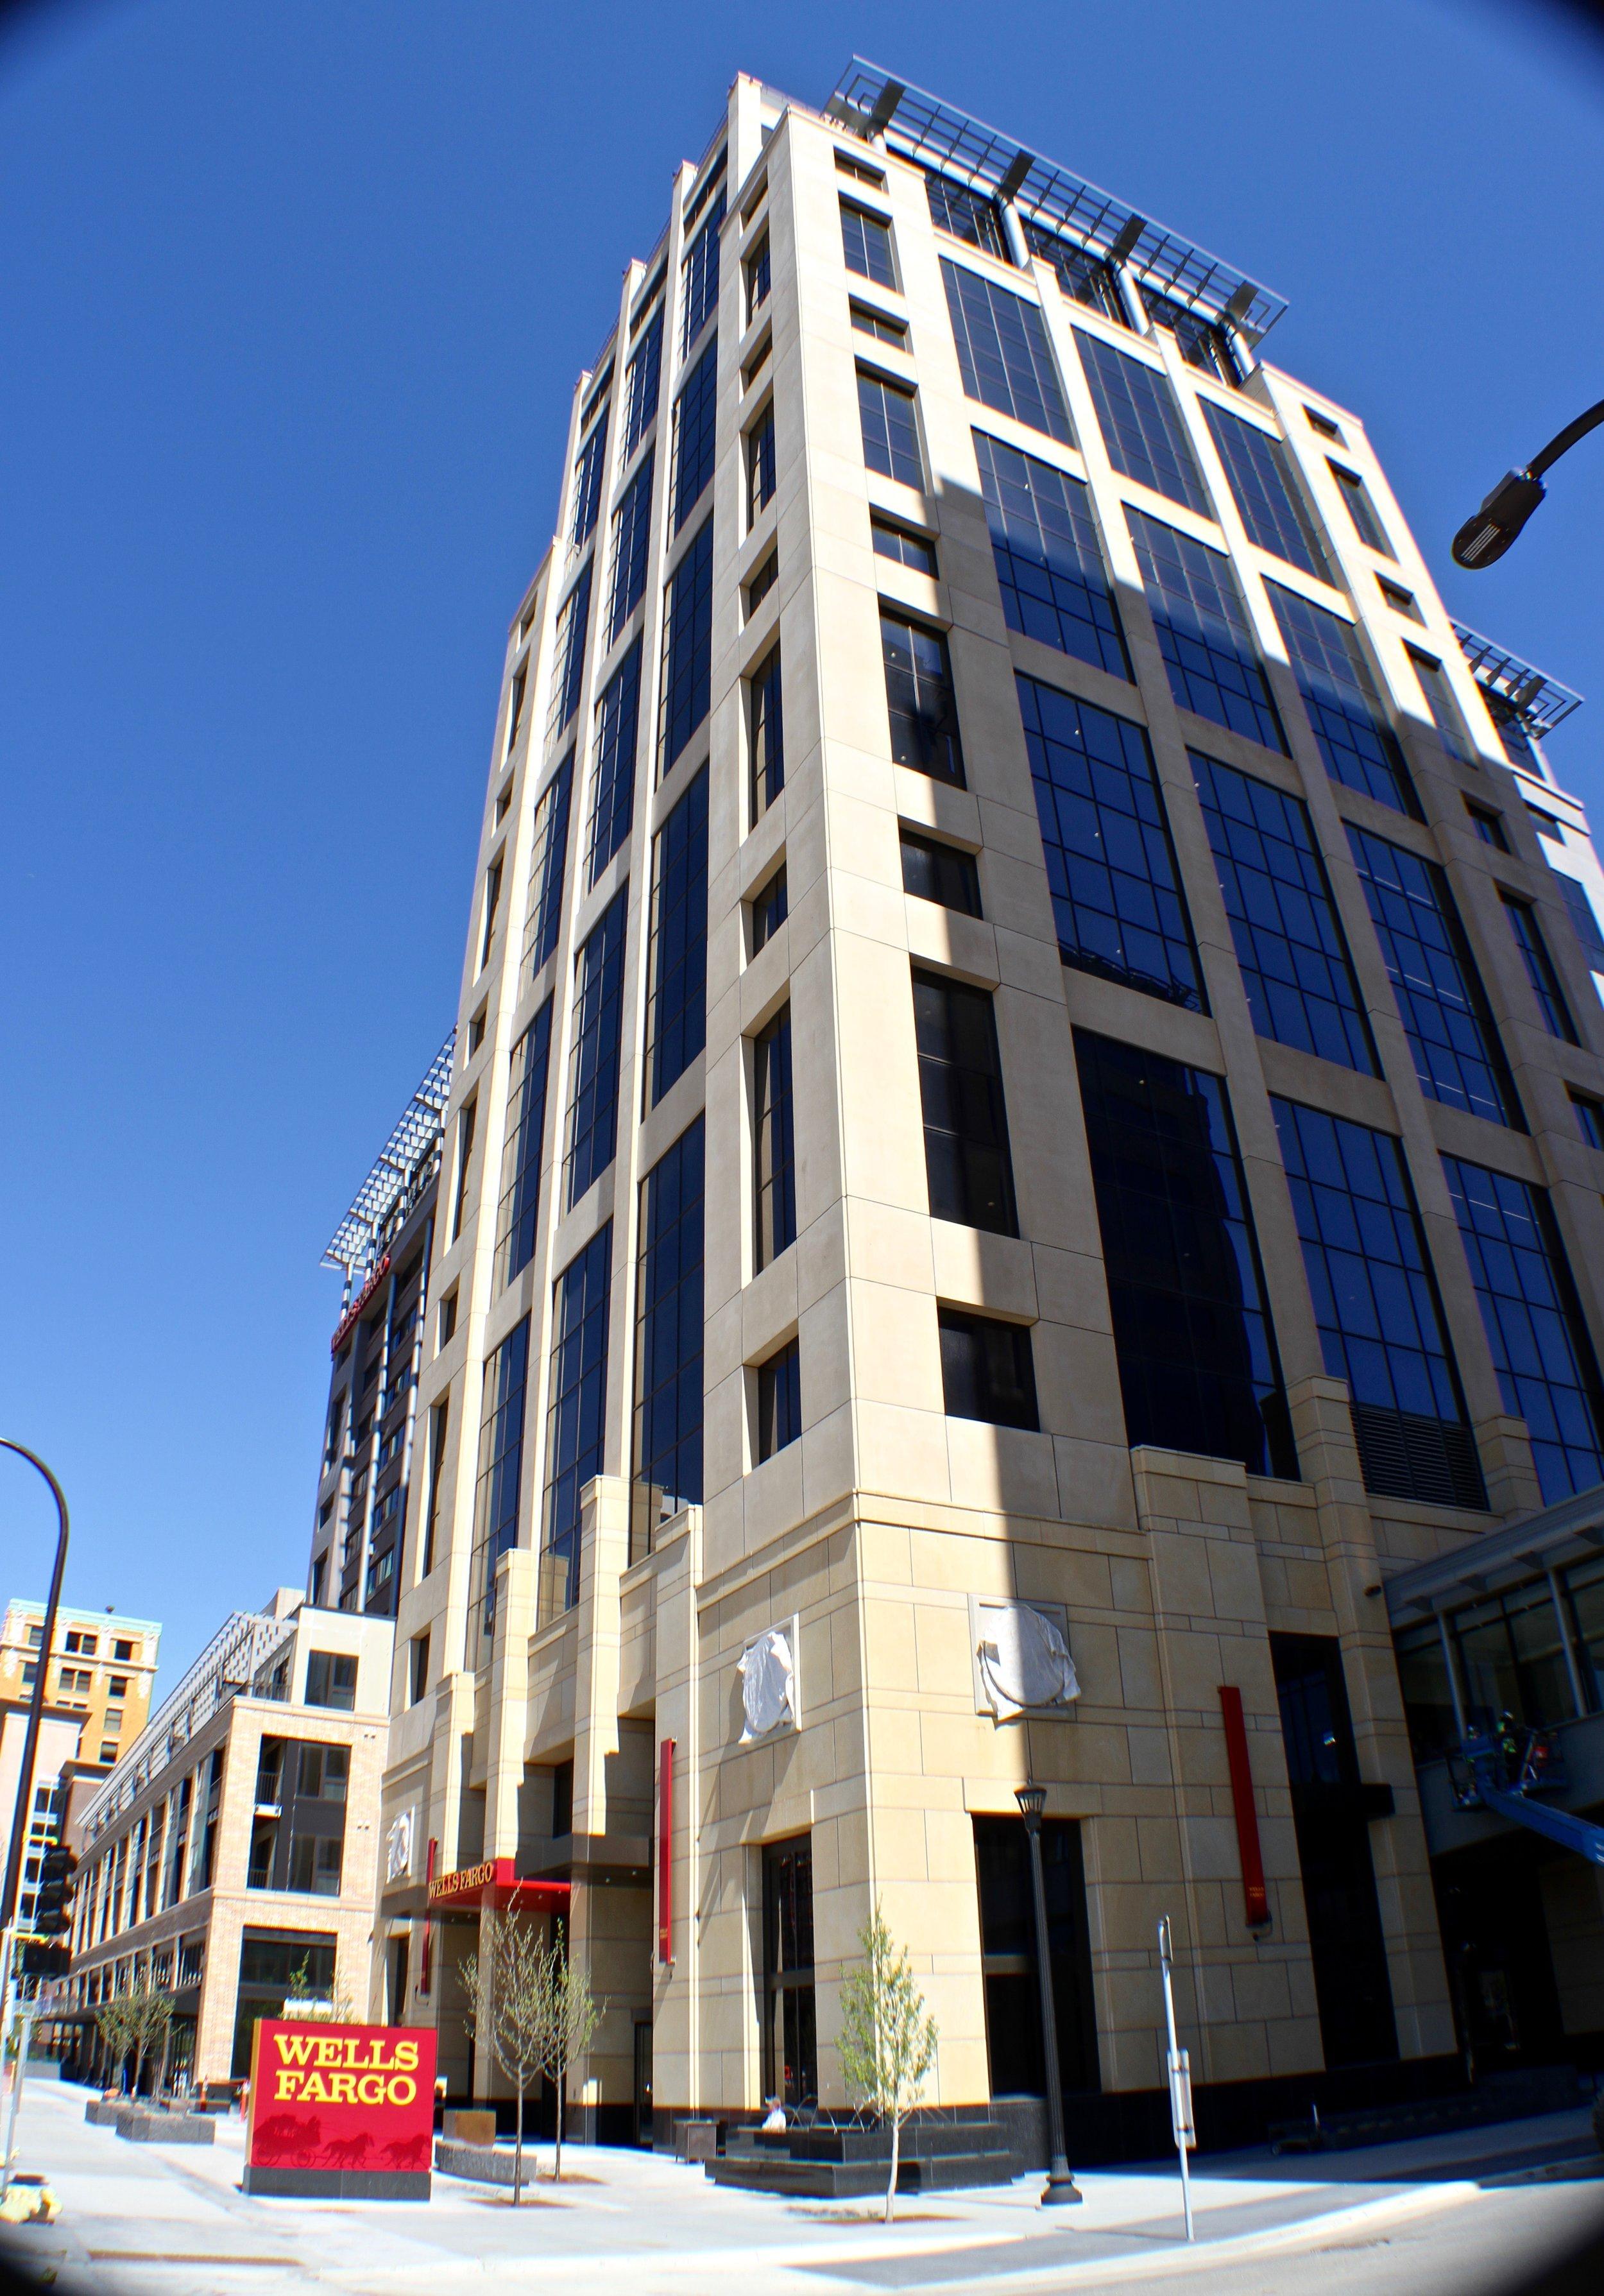 Wells Fargo Building - Minneapolis MN.jpg